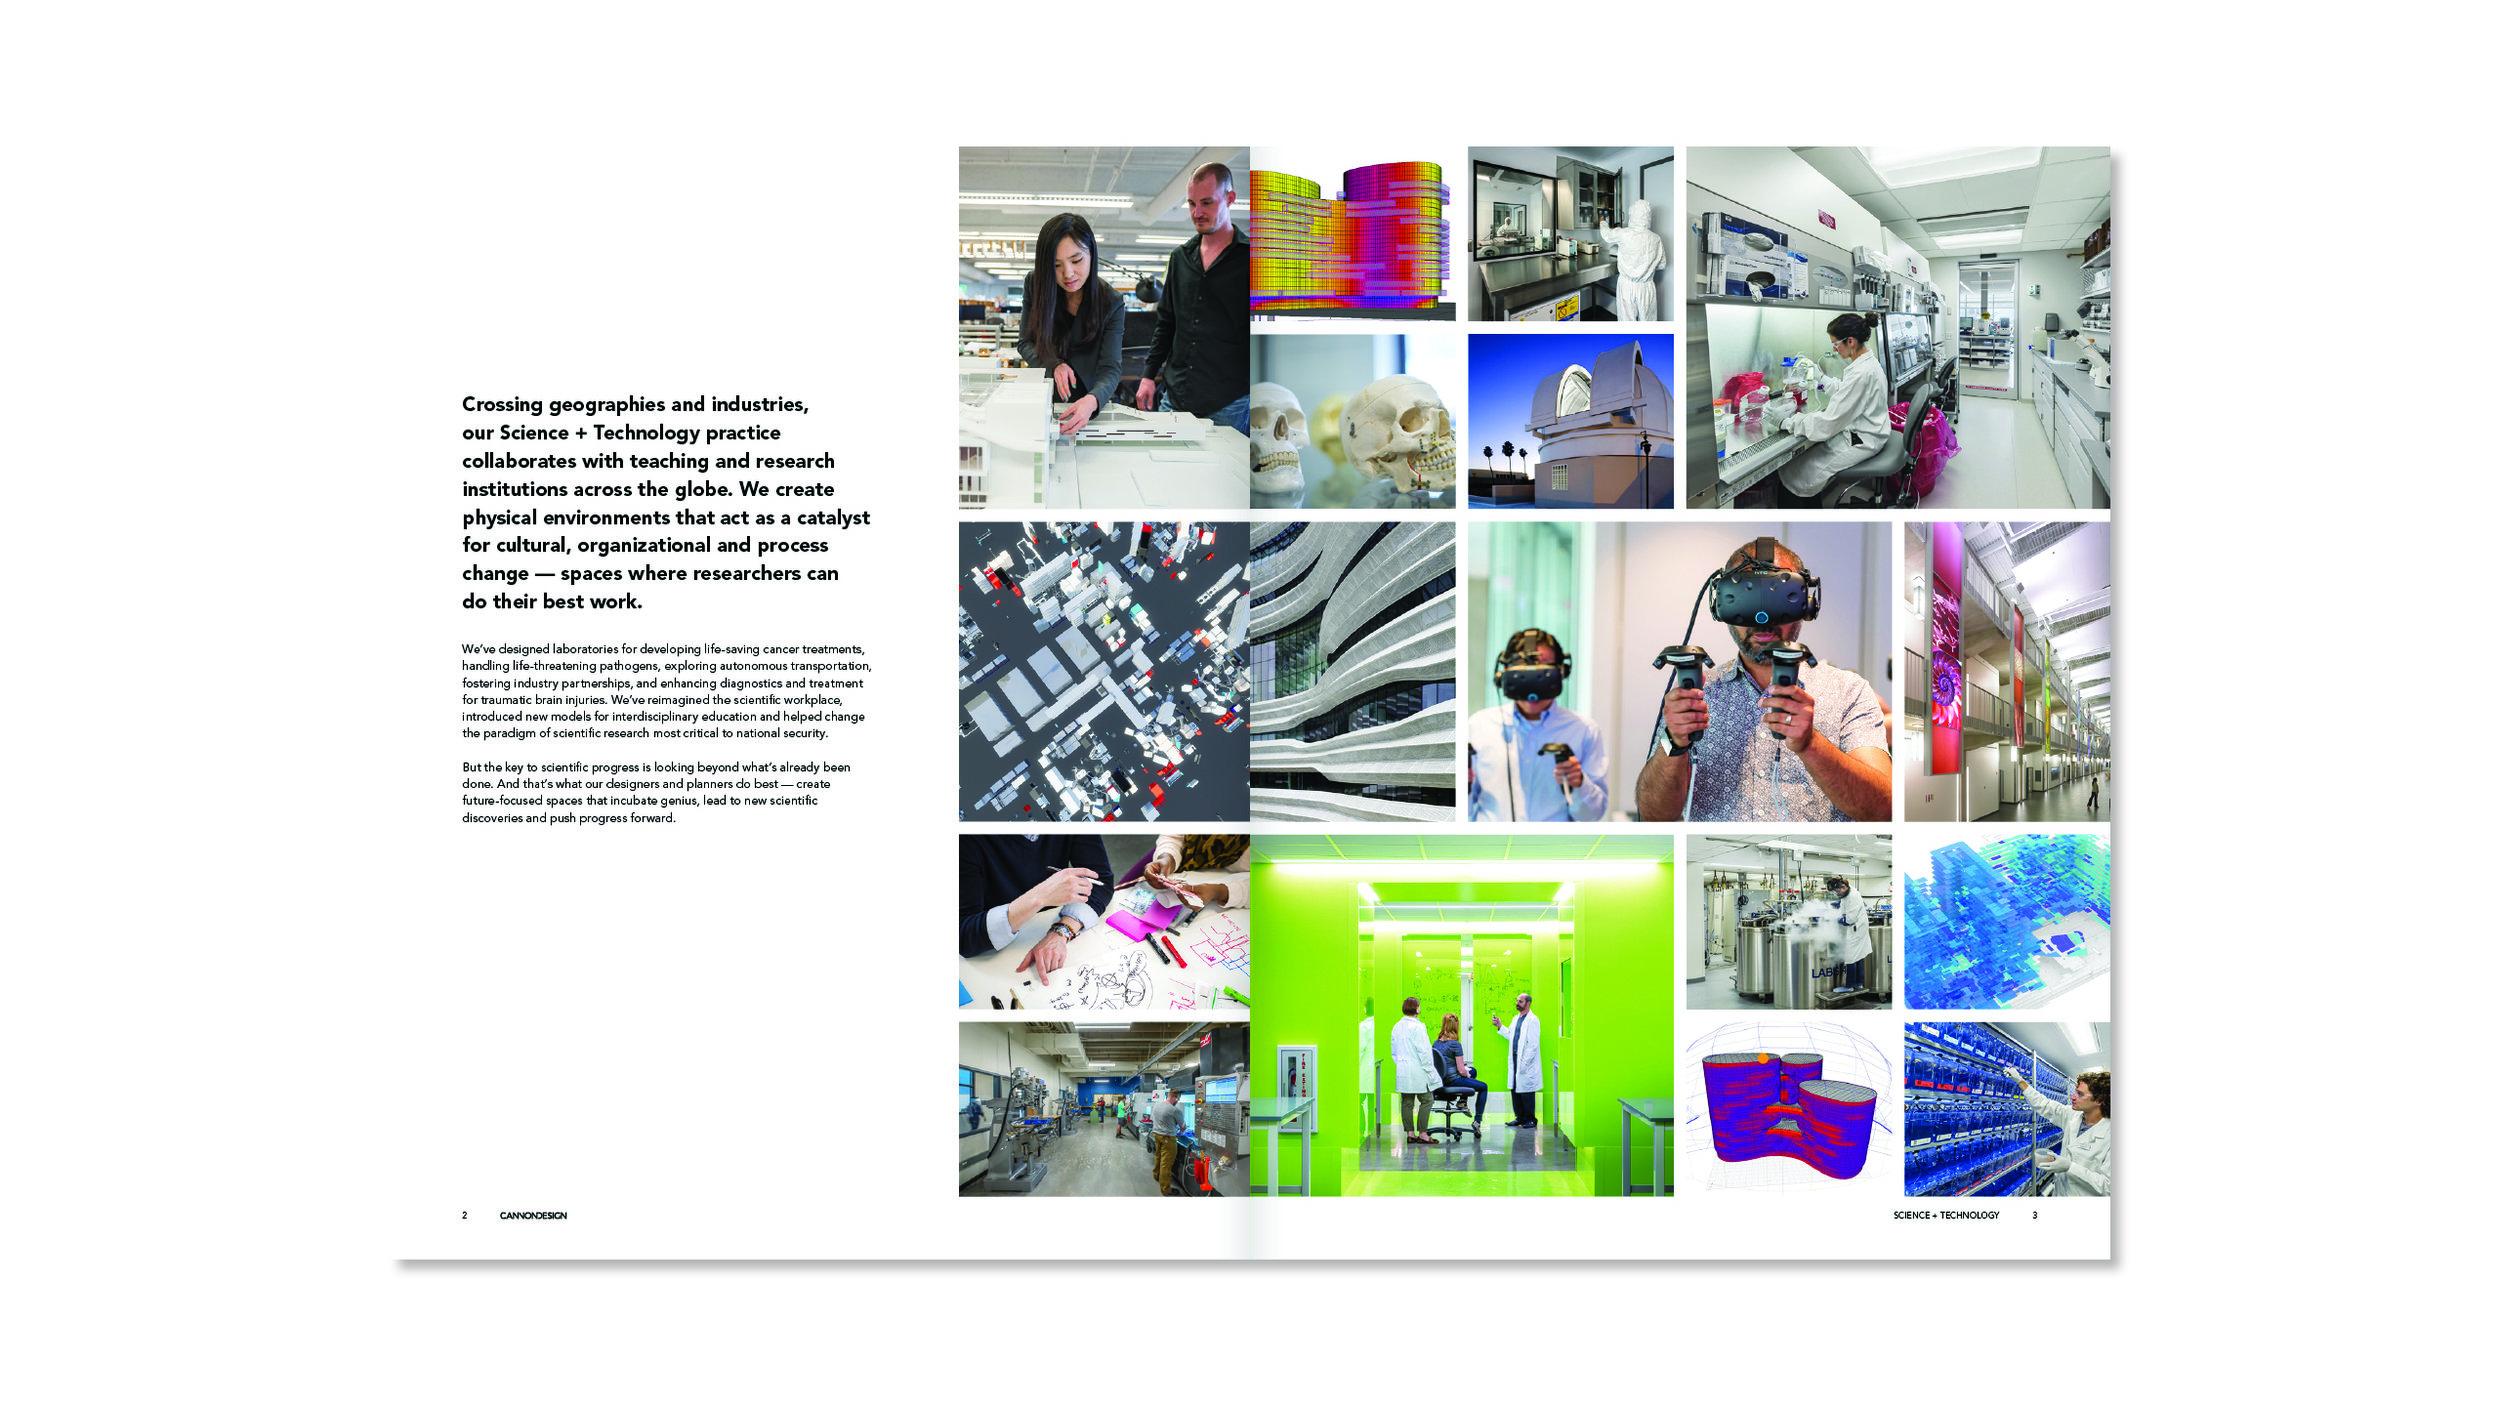 ScienceTechnology3.jpg